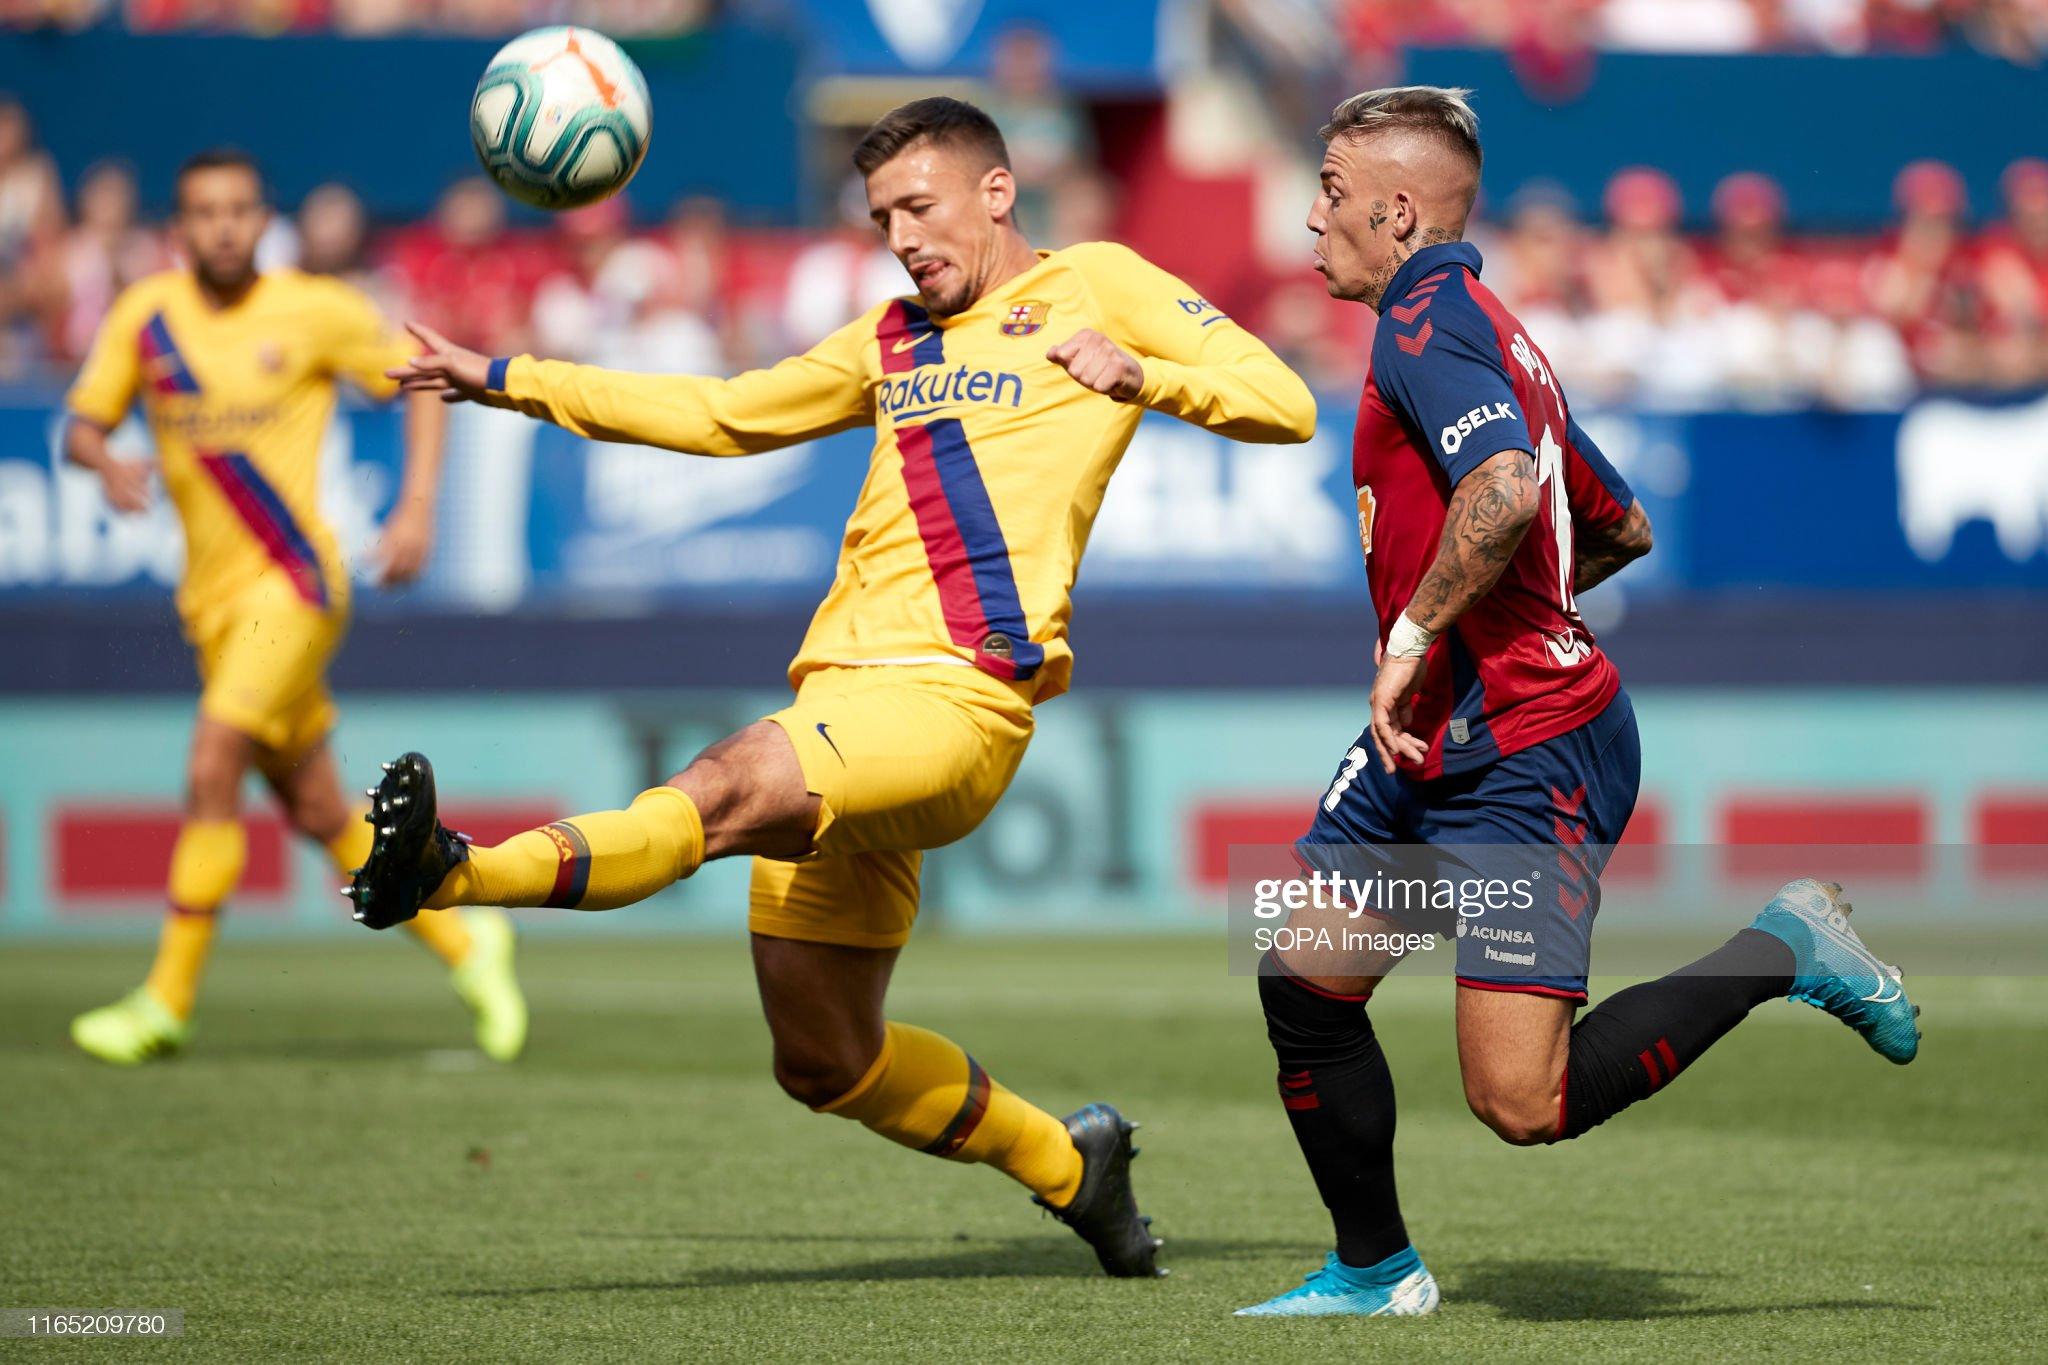 صور مباراة : أوساسونا - برشلونة 2-2 ( 31-08-2019 )  Clement-lenglet-and-brandon-thomas-llamas-in-action-during-the-la-picture-id1165209780?s=2048x2048